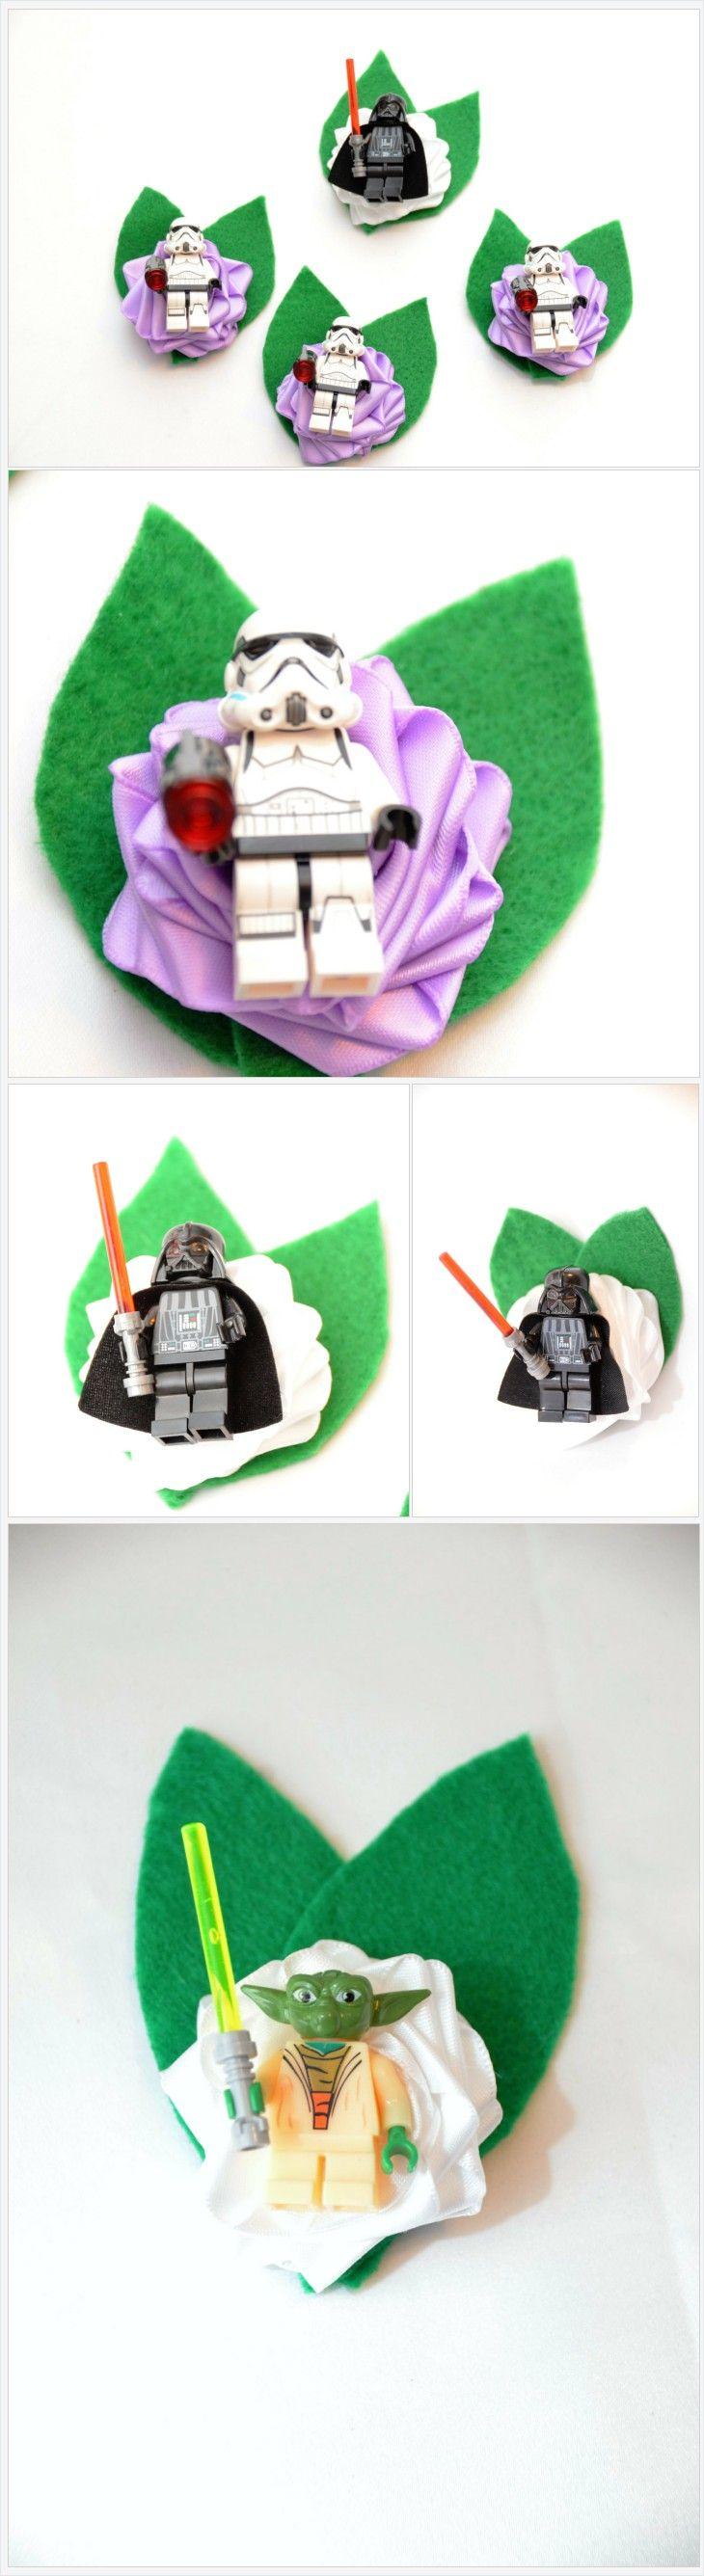 Wedding Geek Nerd Brick Style Boutonniere ~ Star Wars ~ Darth Vader ~ Luke Skywalker ~ Han Solo ~ Yoda ~ Sith Lords https://www.thedivinitybraid.com/listing/486184518/wedding-geek-nerd-brick-style